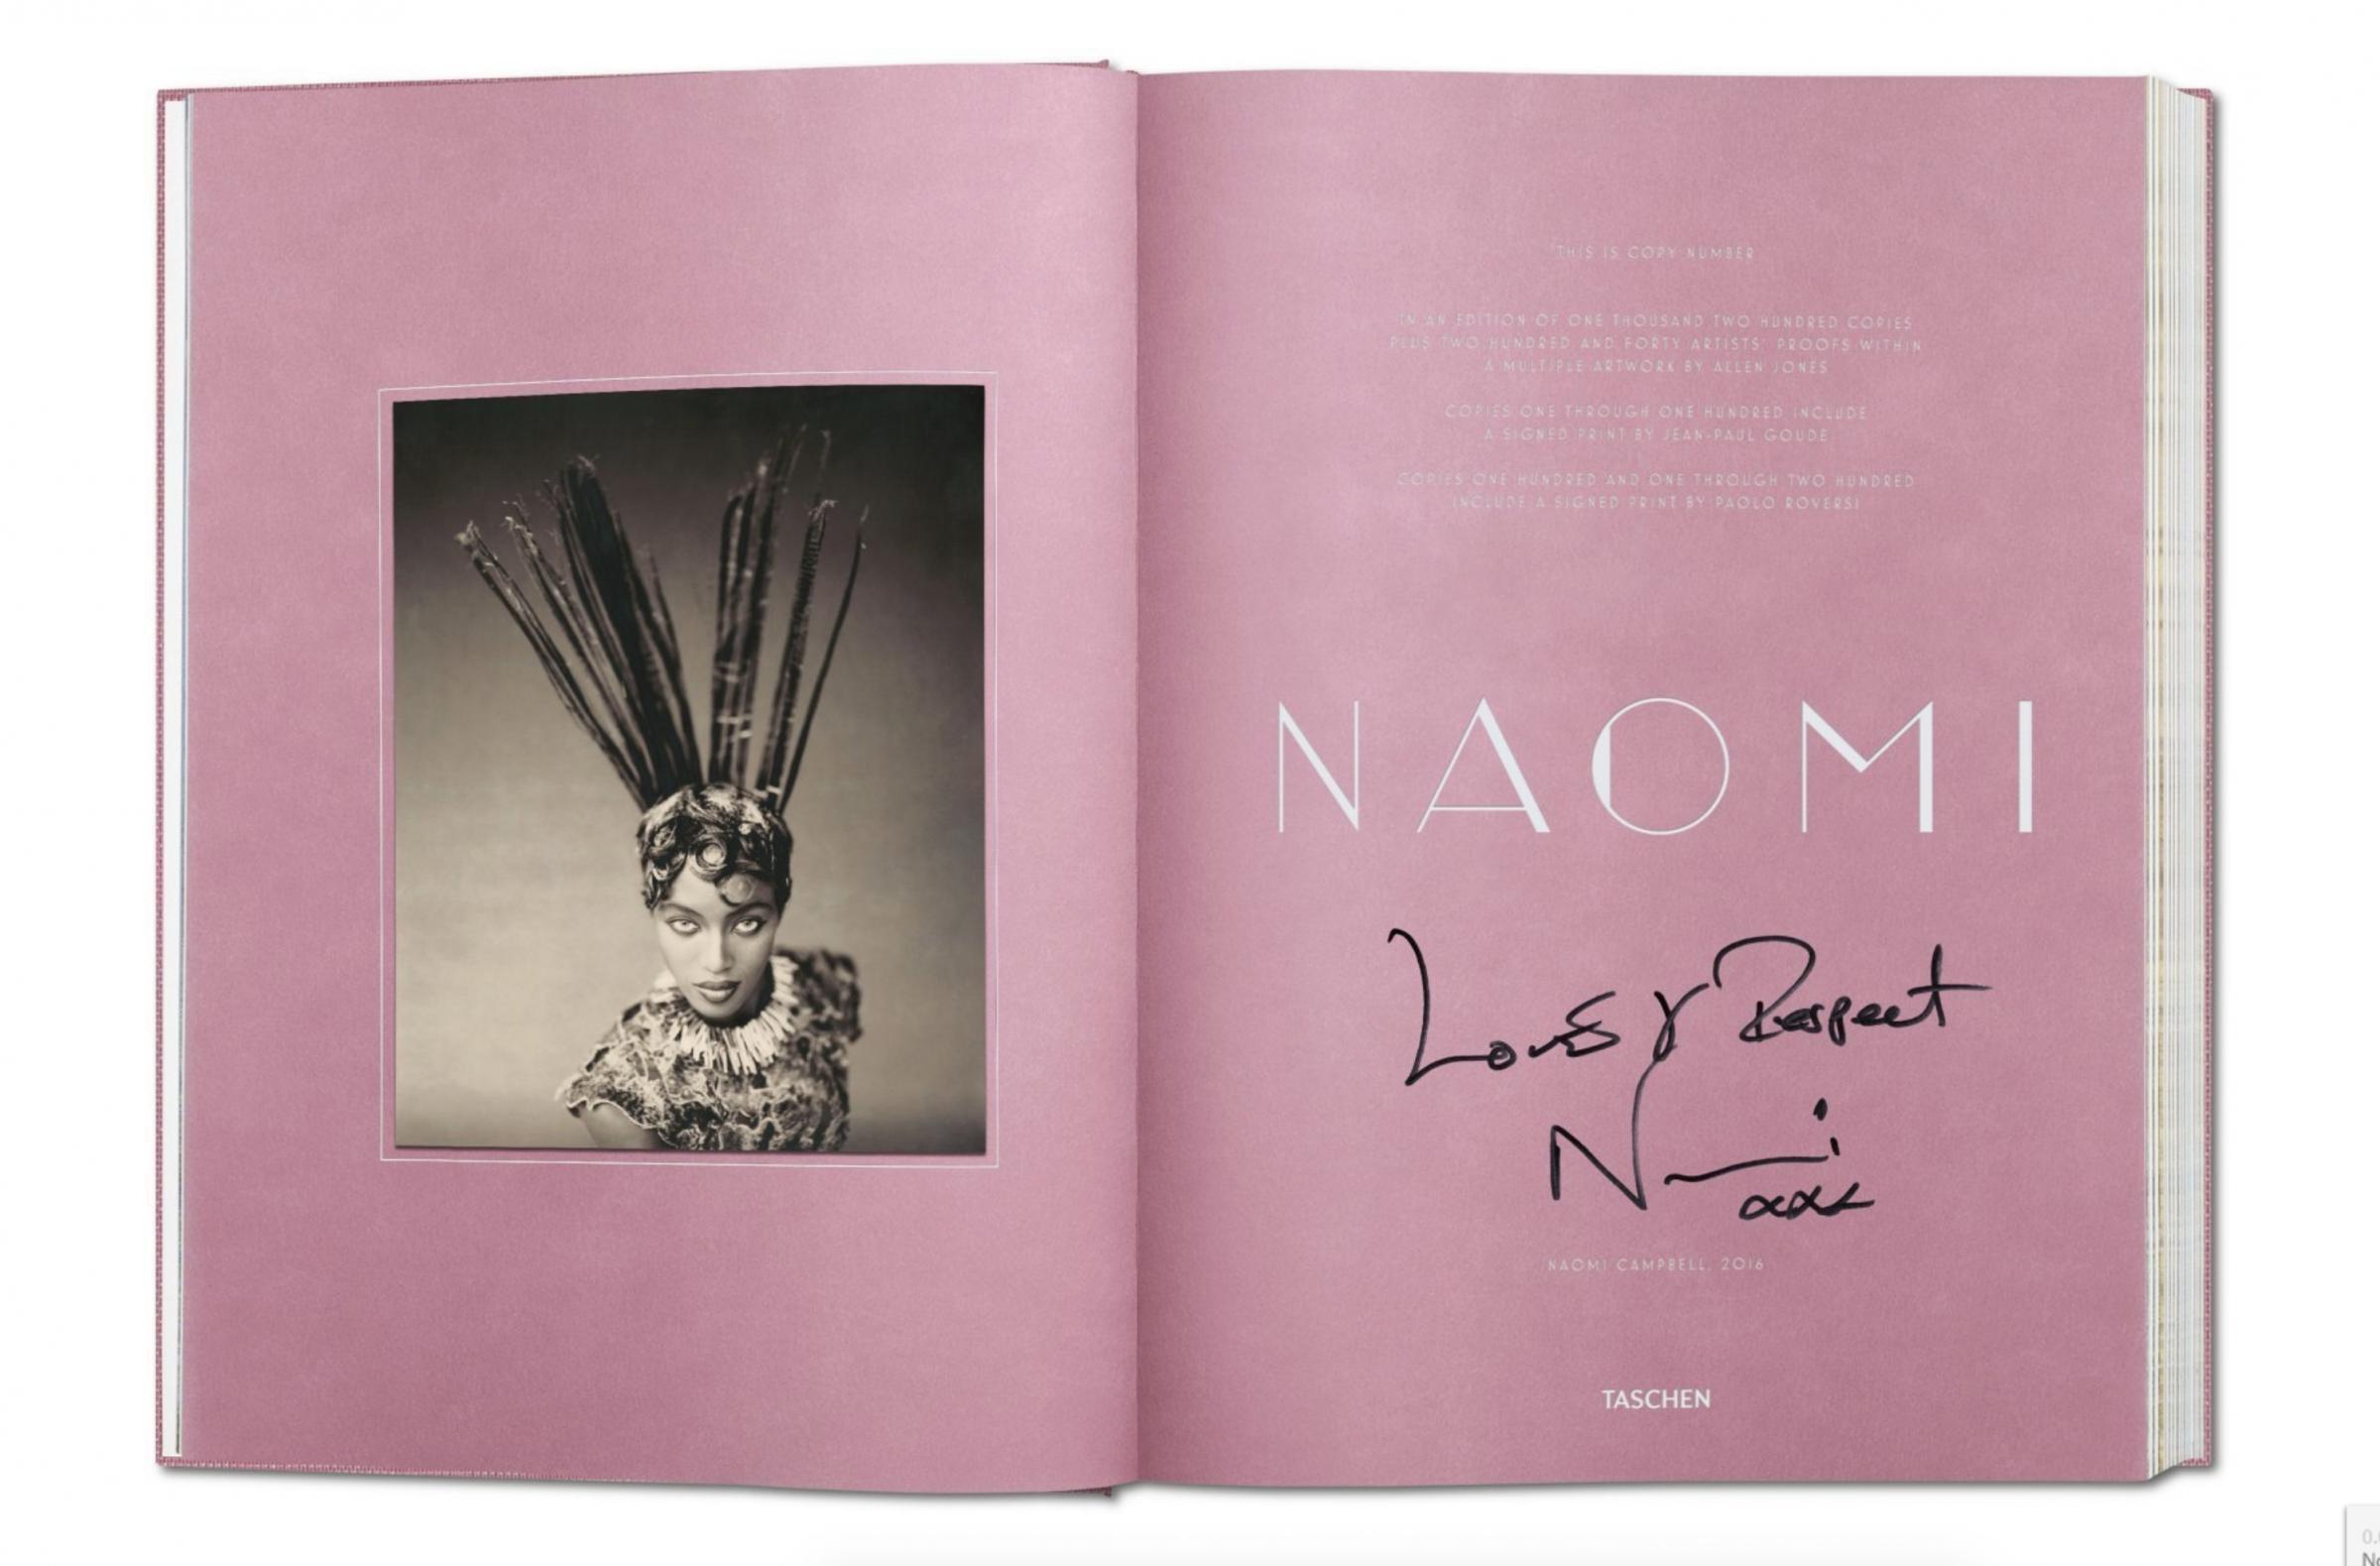 Taschen推出十本限量版《NAOMI CAMPBELL》簽名本,售價盛惠港幣$25,000。